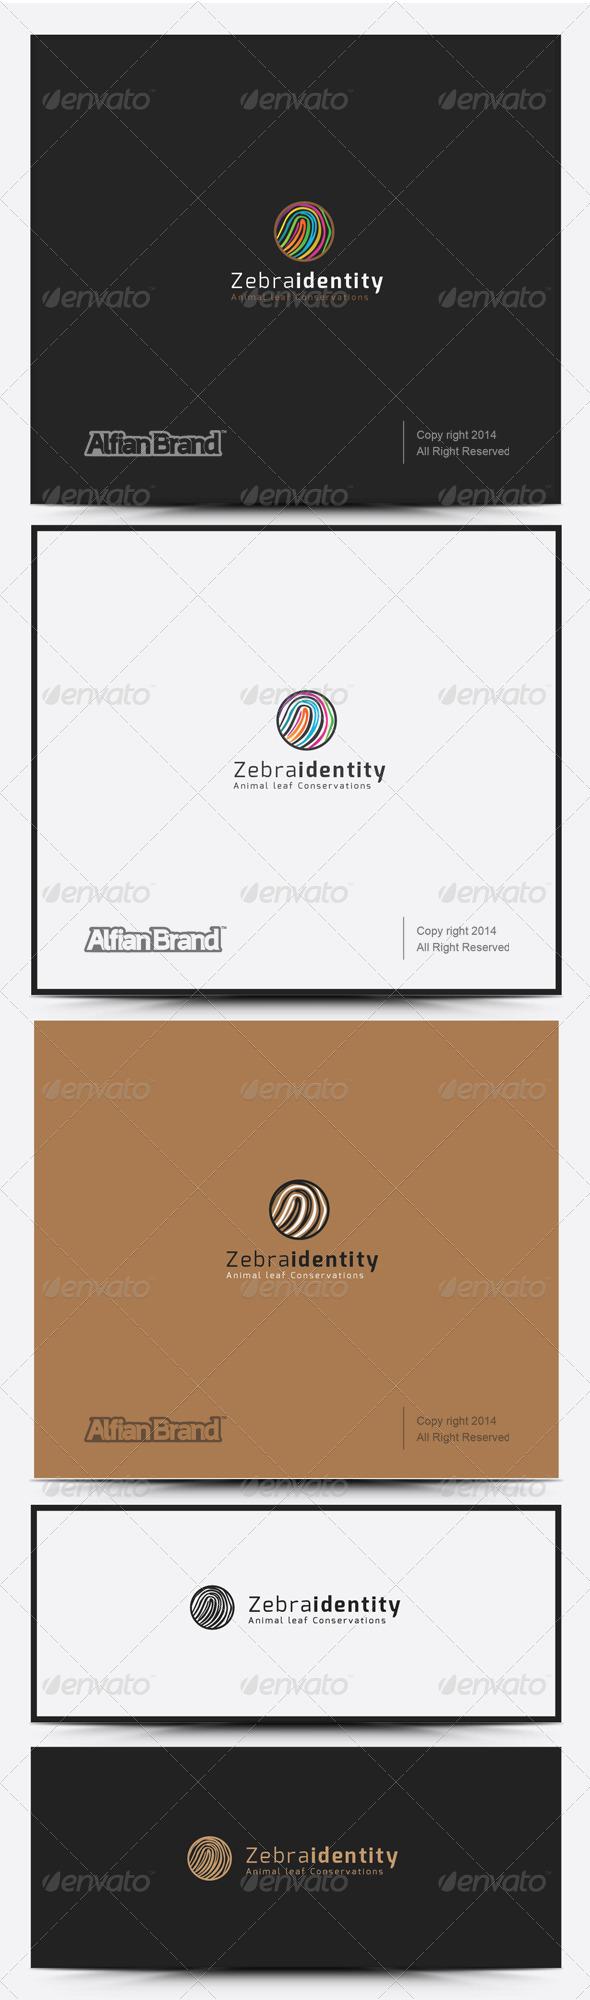 GraphicRiver Zebra Identity Logo 8318004